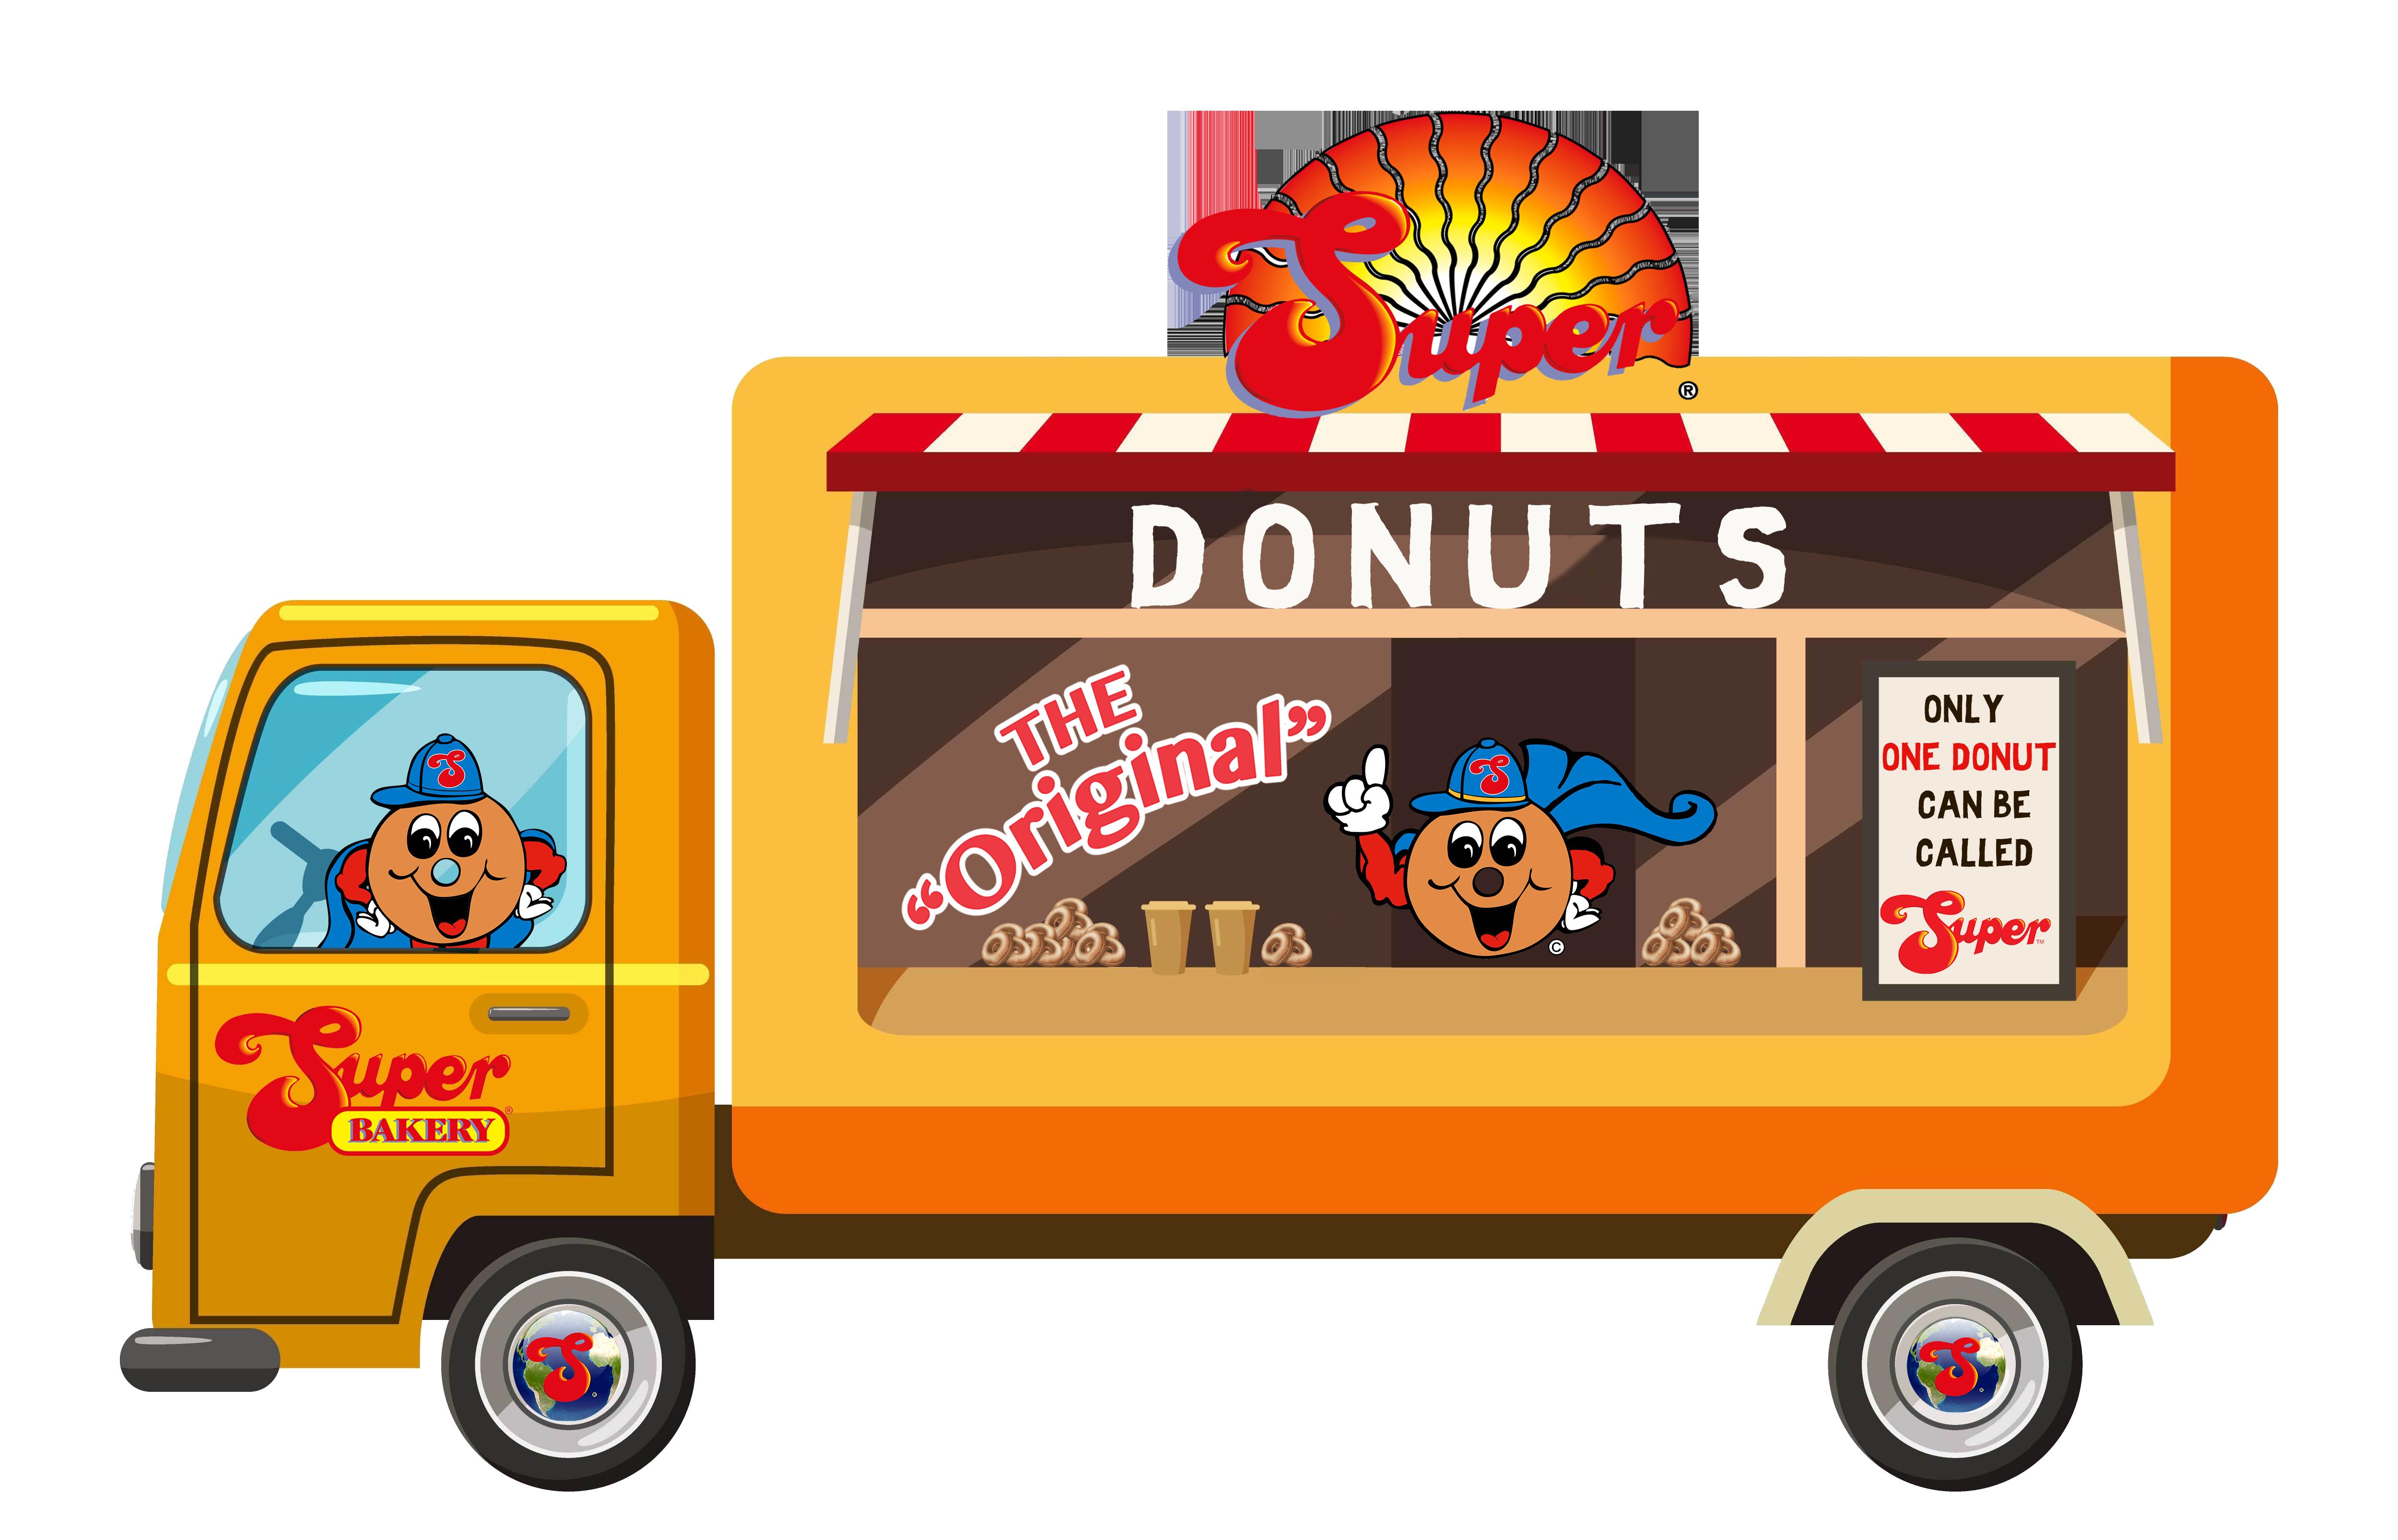 Donut clipart truck. Product catalog super bakery